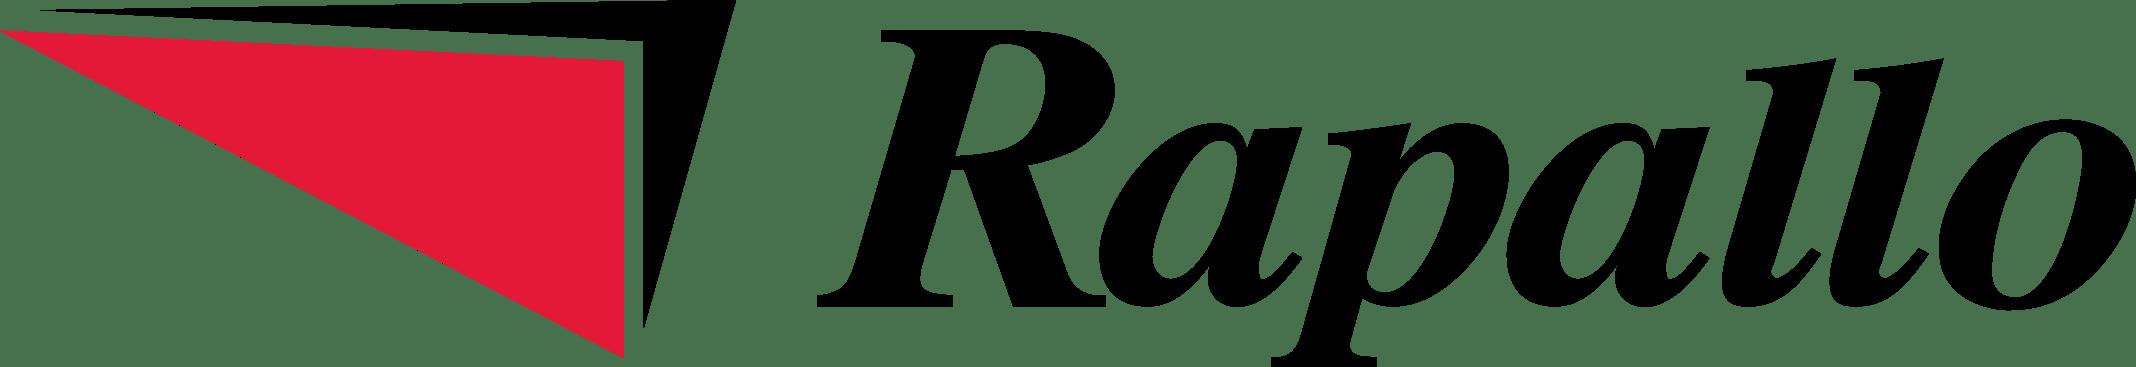 rapallo.com.au